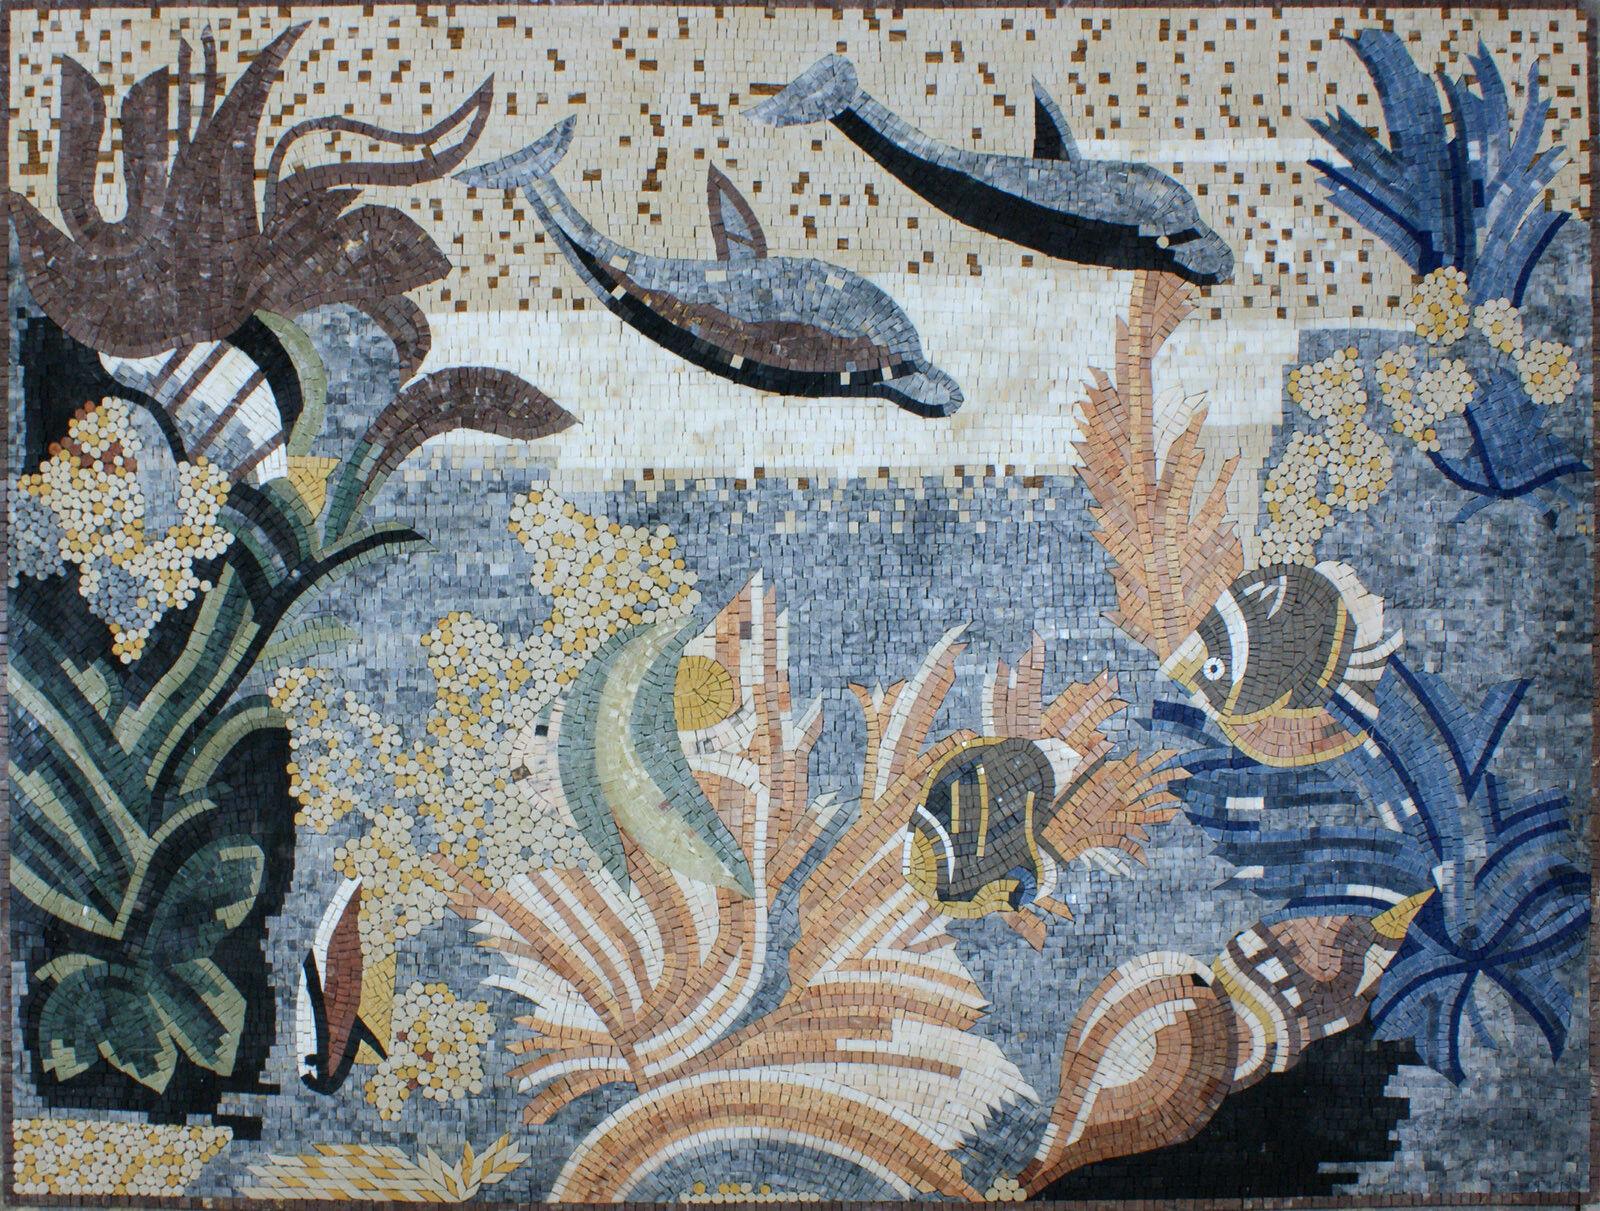 Art Tile Stone Floral Decor Sea World Sea Creatures Marble Mosaic AN890